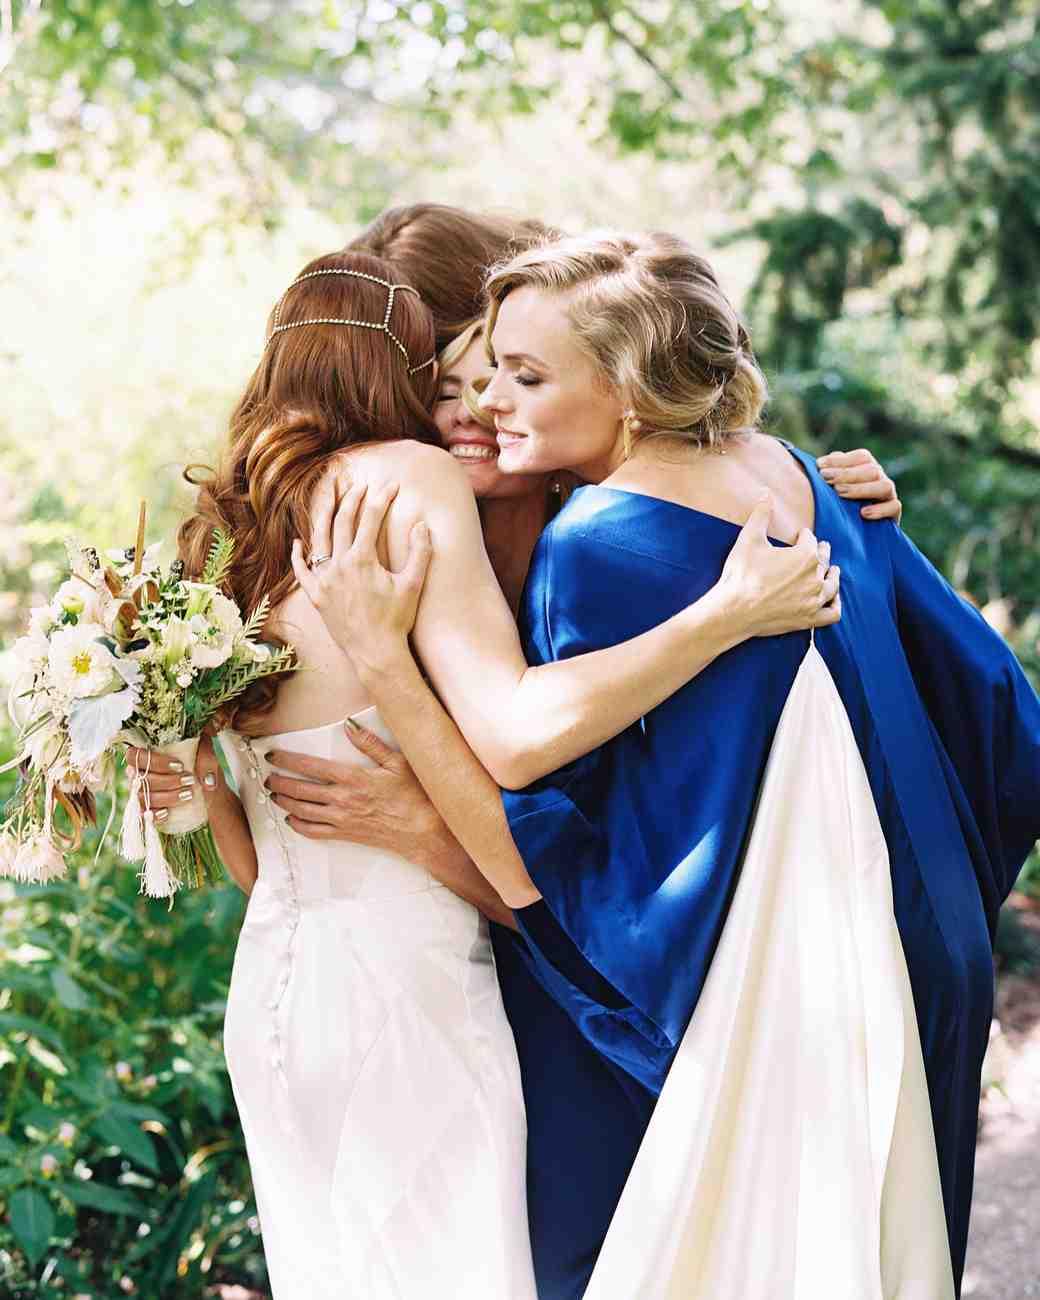 bridal-party-candids-1-0416.jpg